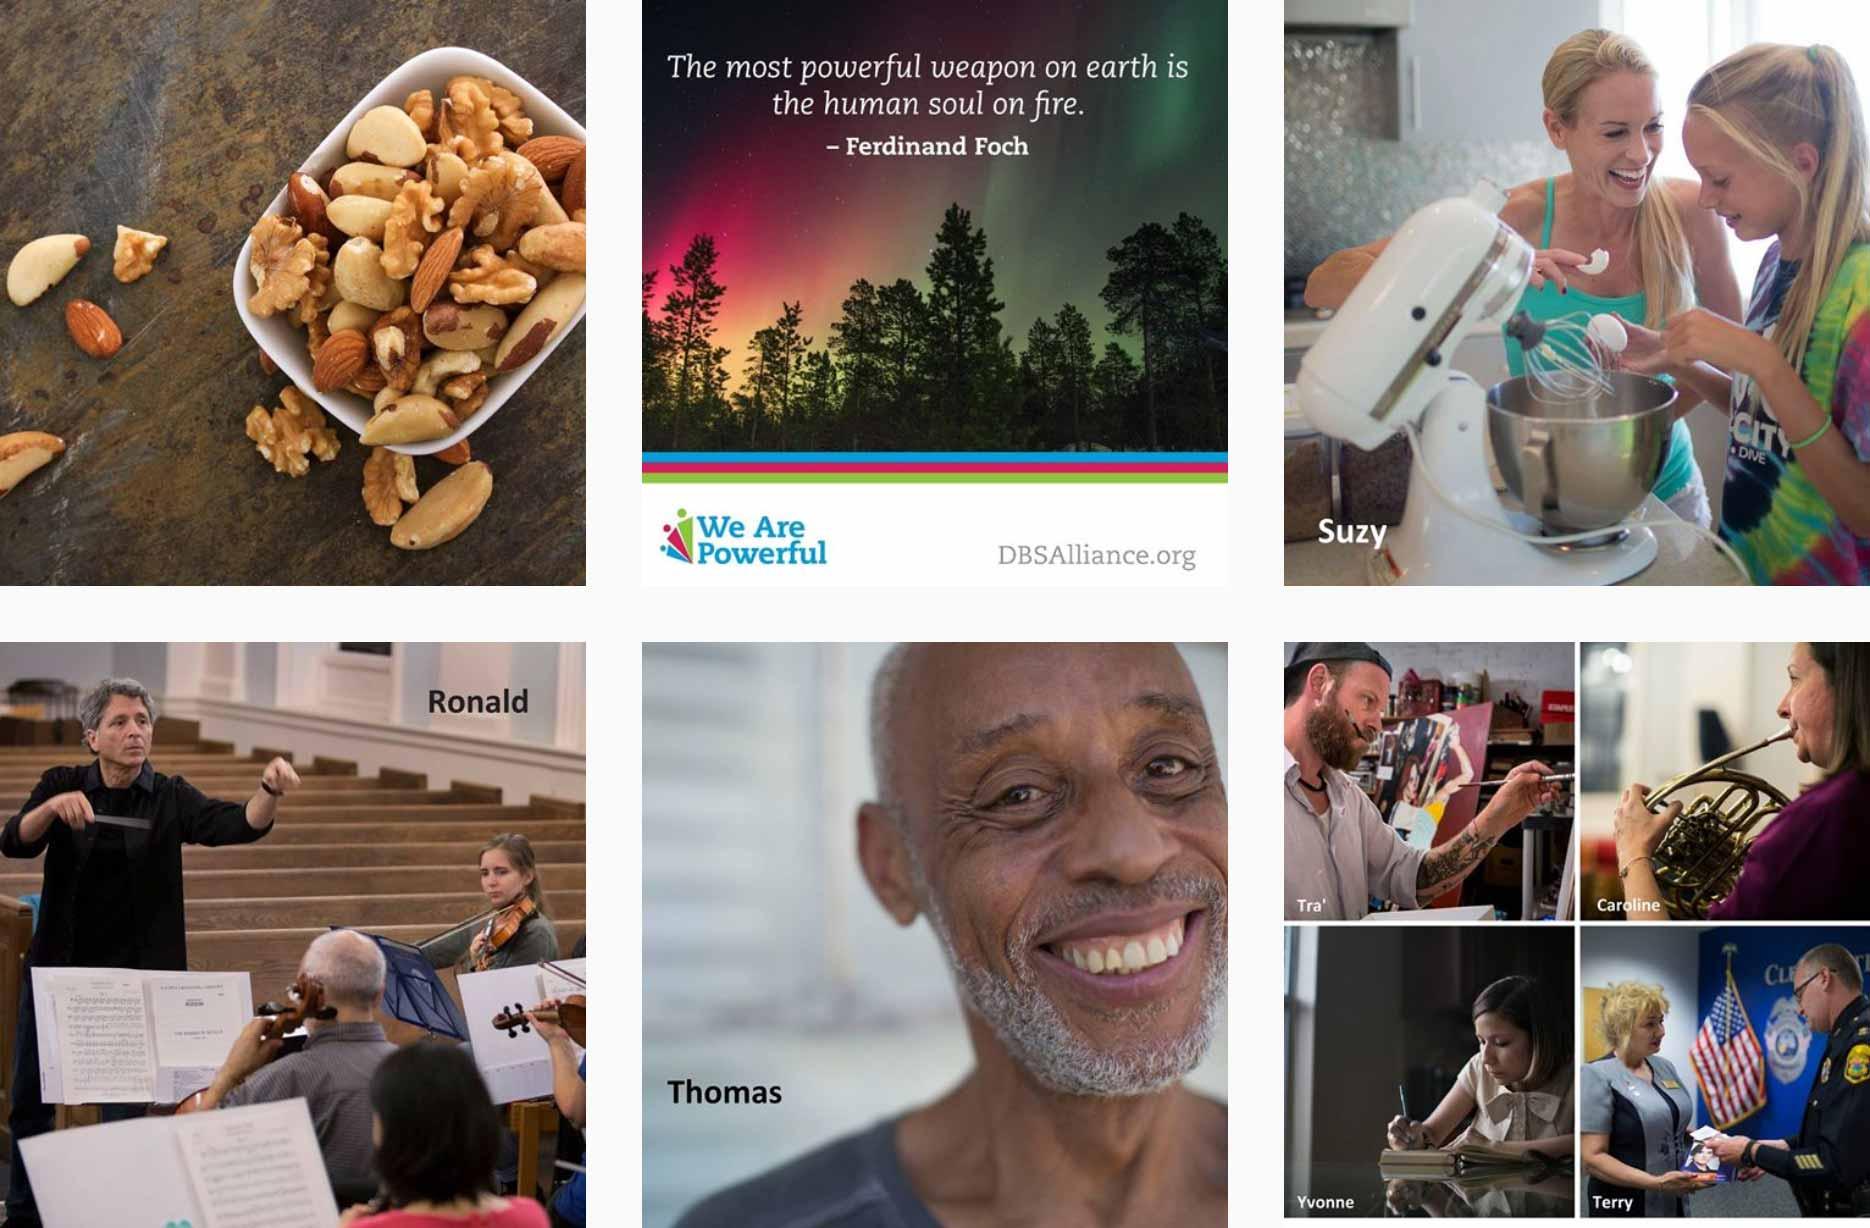 dbsa-feeds-bipolar-disorder-instagram-accounts-oc87-recovery-diaries-2000x1050